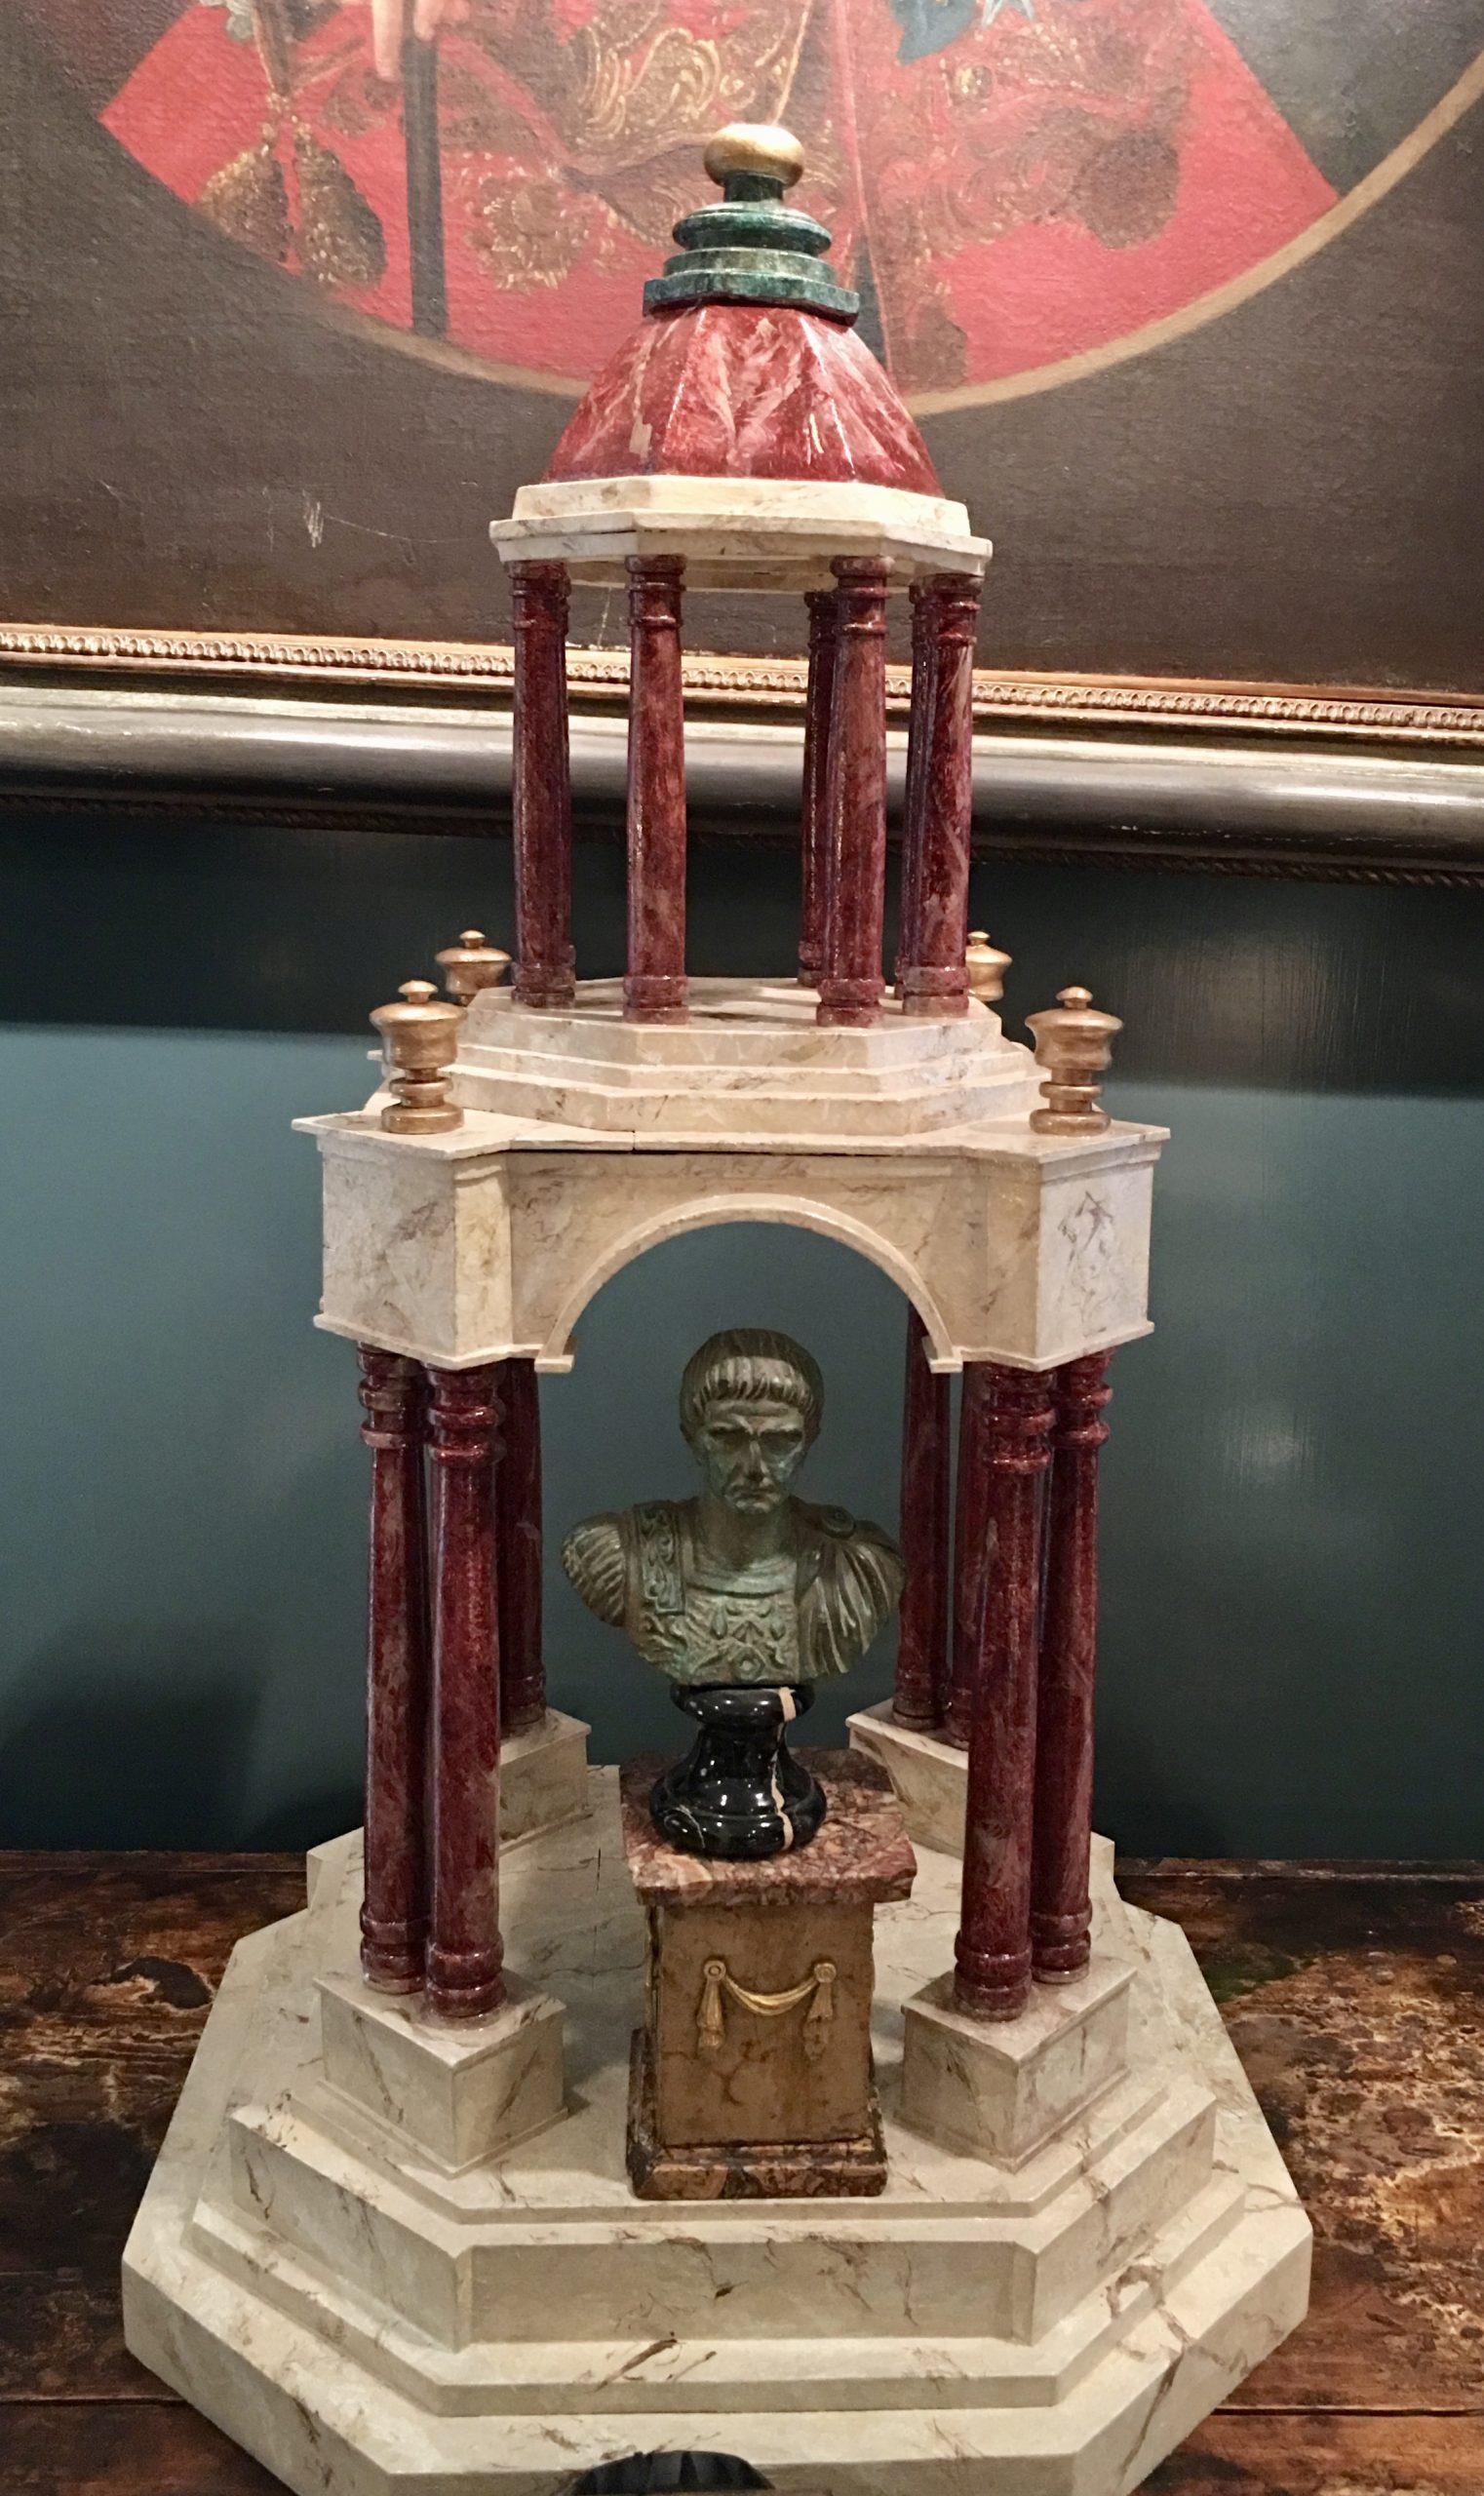 Templete de falsos mármoles